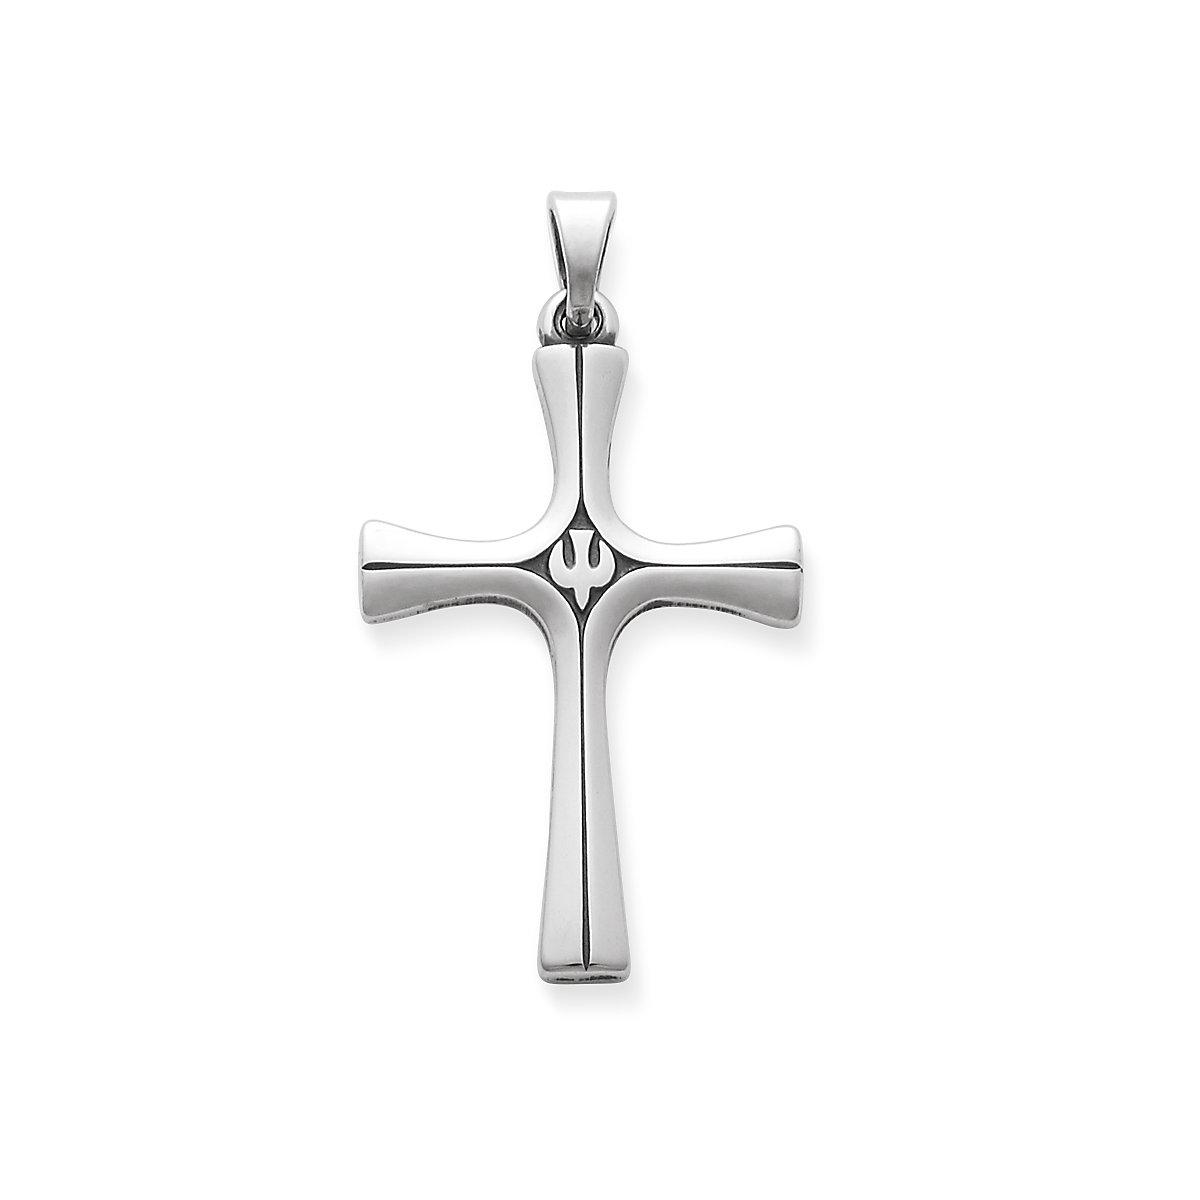 Religious spiritual cross jewelry james avery serenity cross medium biocorpaavc